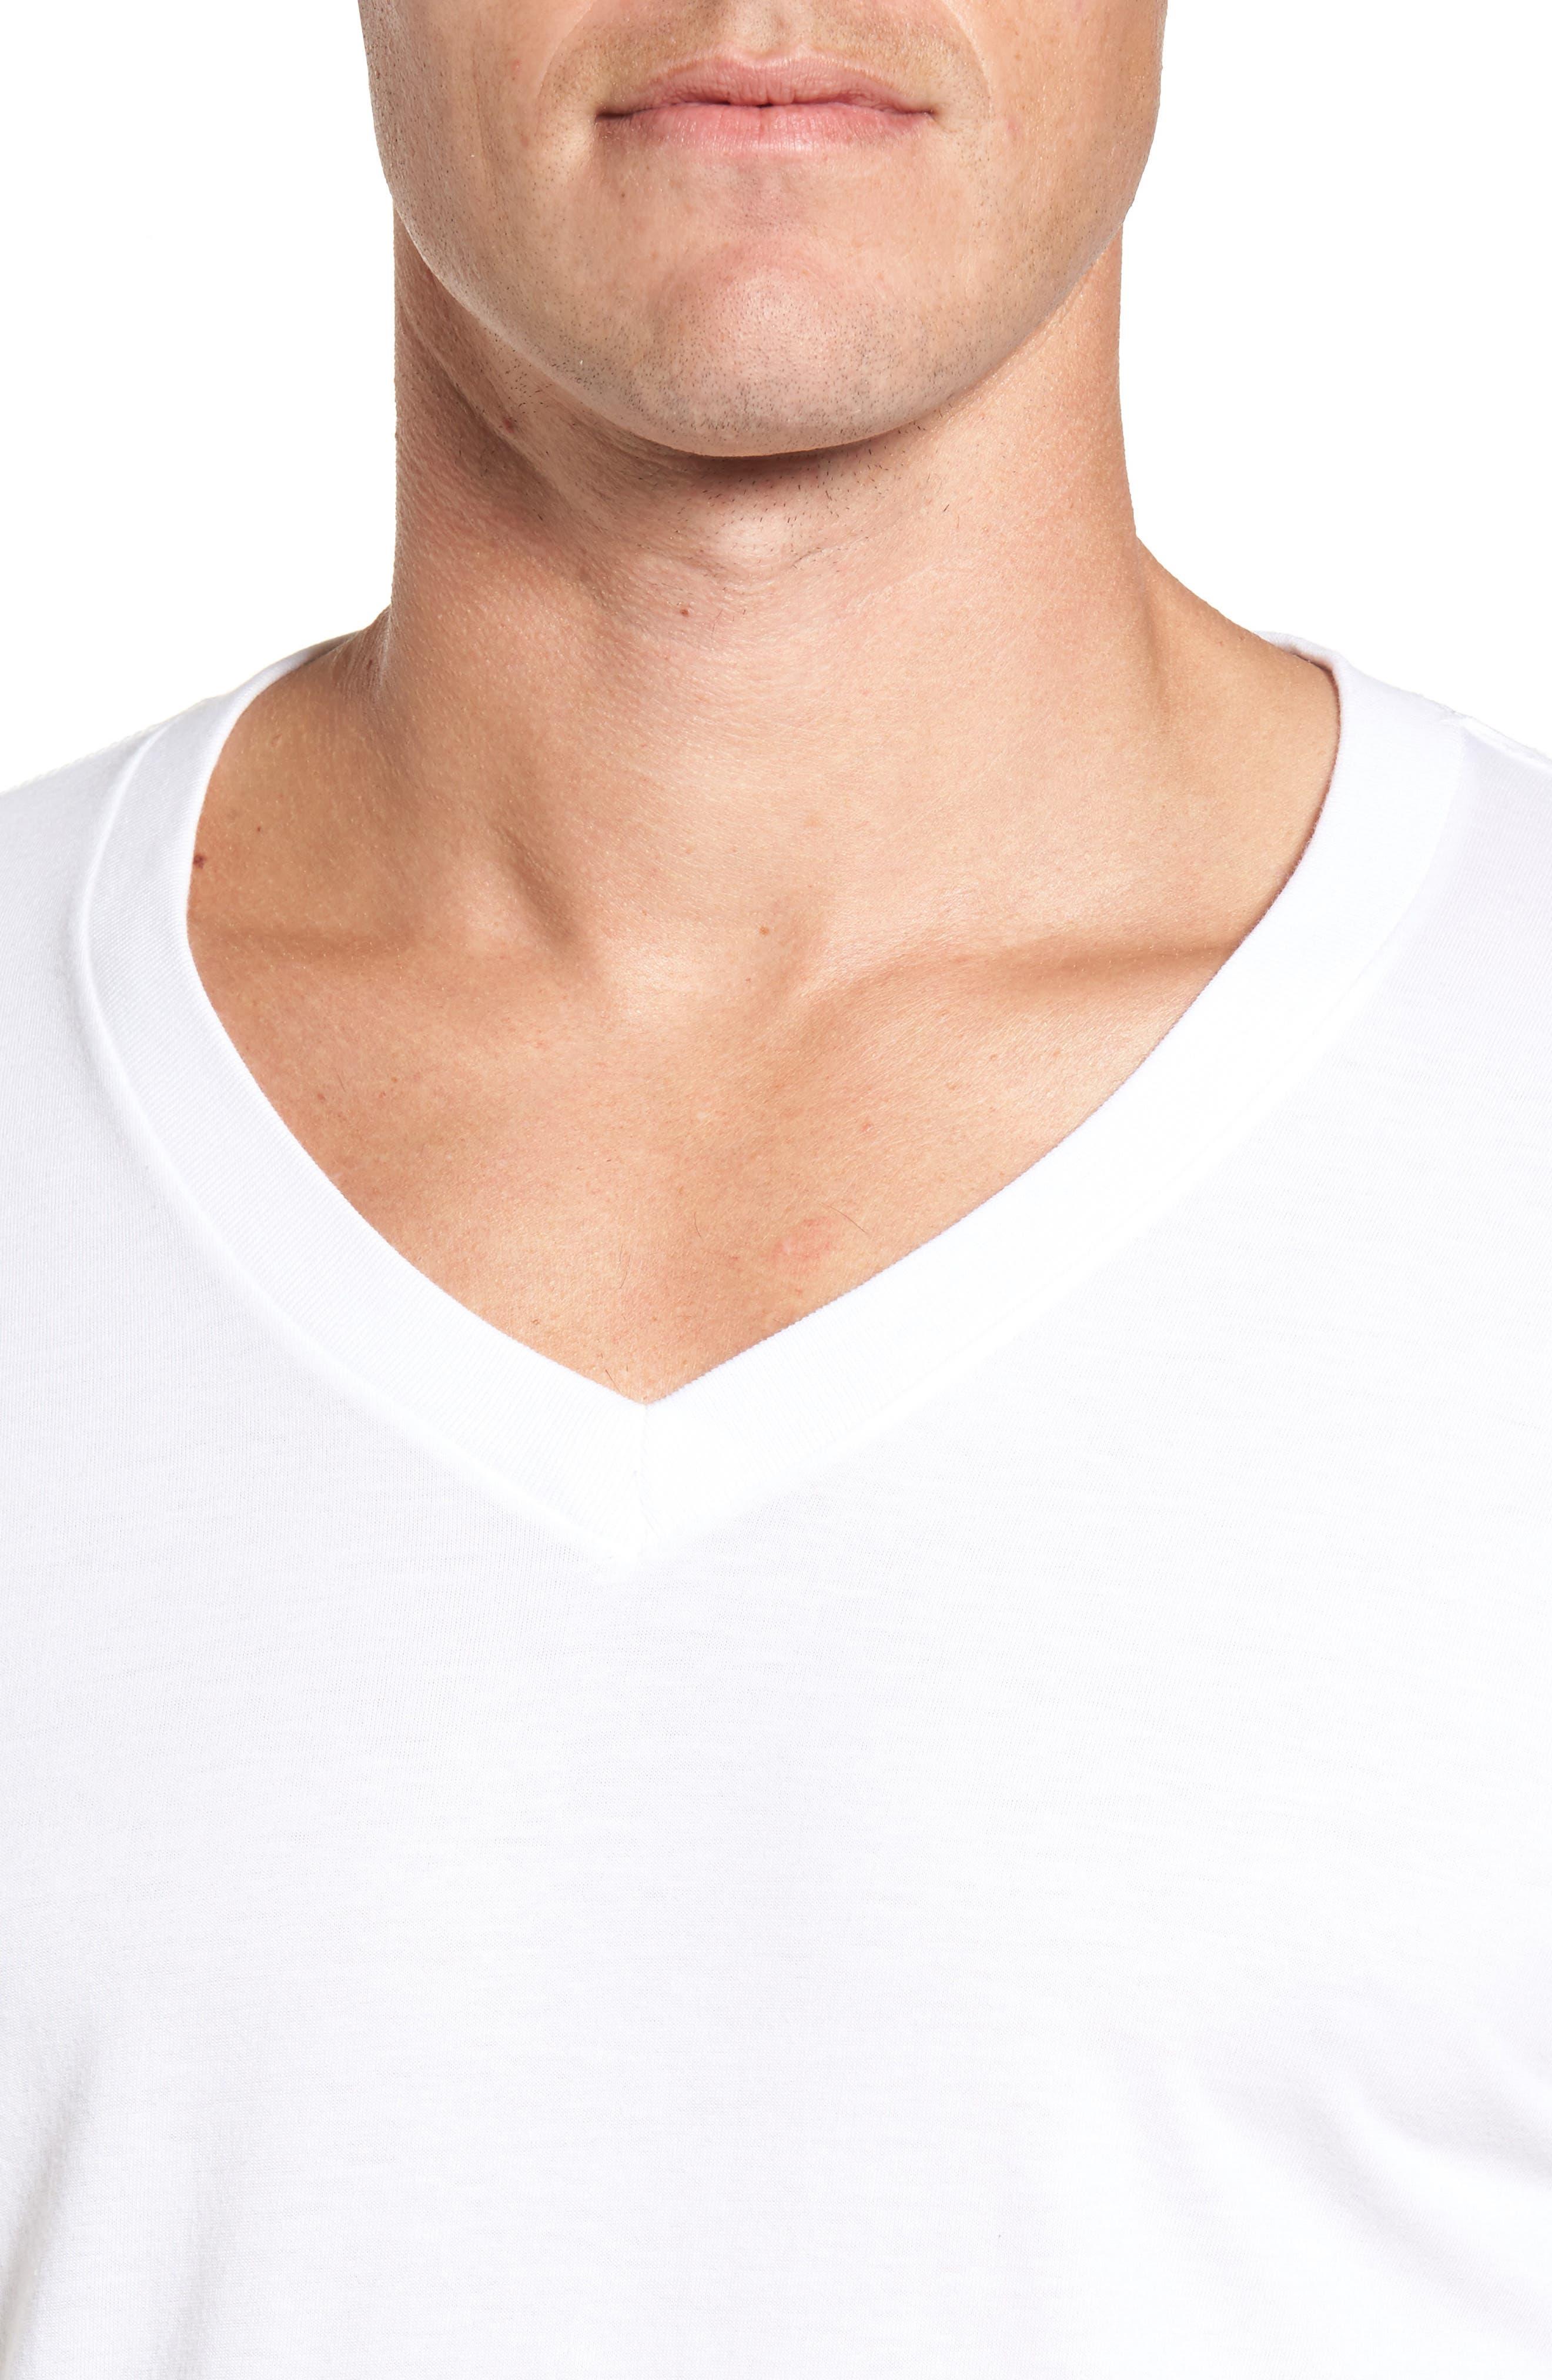 NORDSTROM MEN'S SHOP, 4-Pack Regular Fit Supima<sup>®</sup> Cotton V-Neck T-Shirts, Alternate thumbnail 4, color, WHITE